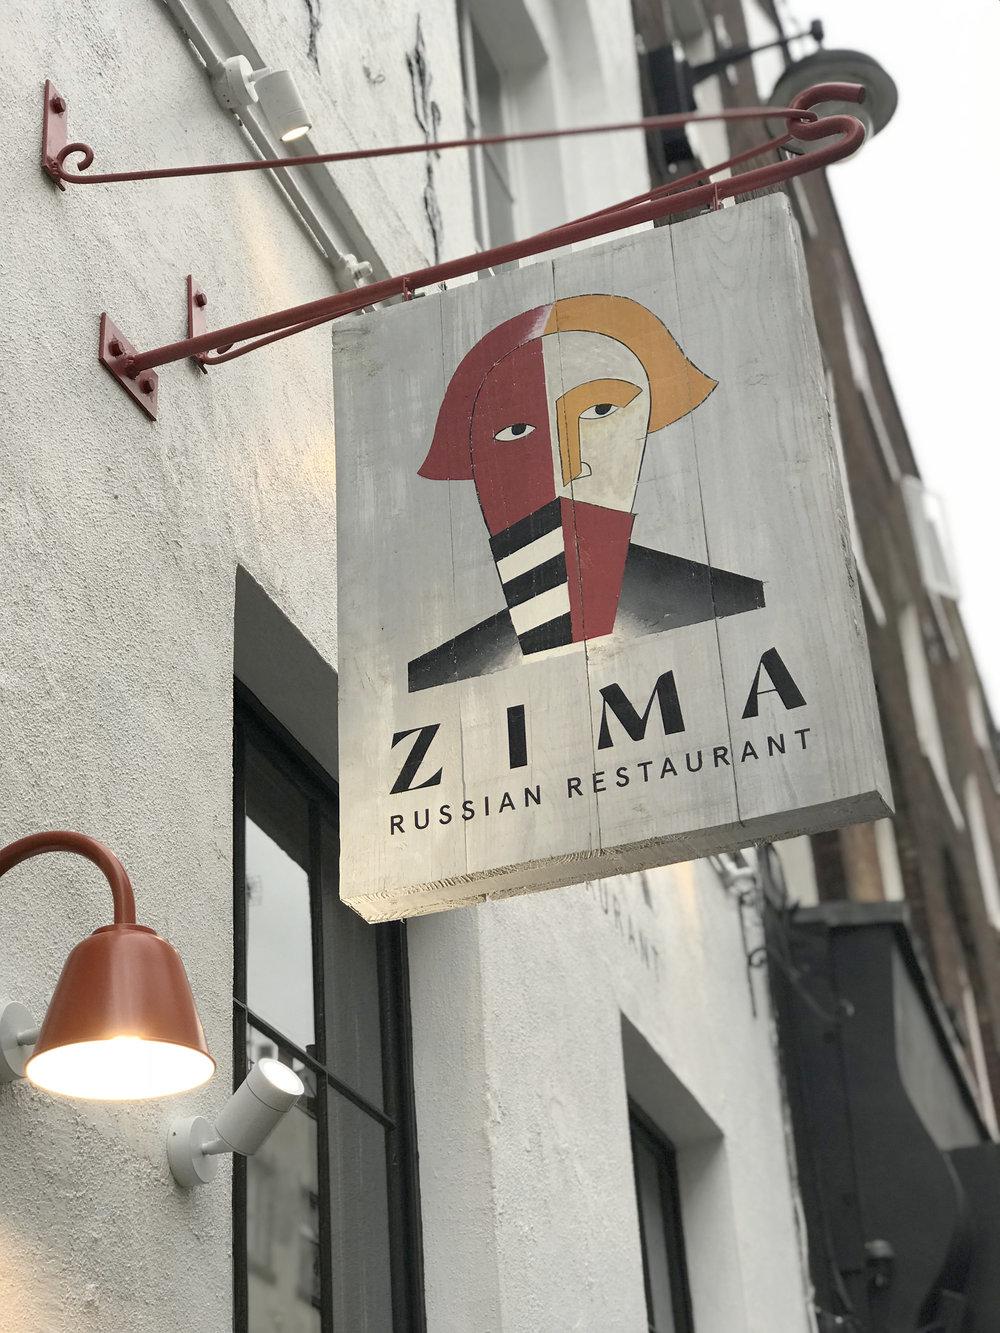 Zima signage by An Artful Life Studio